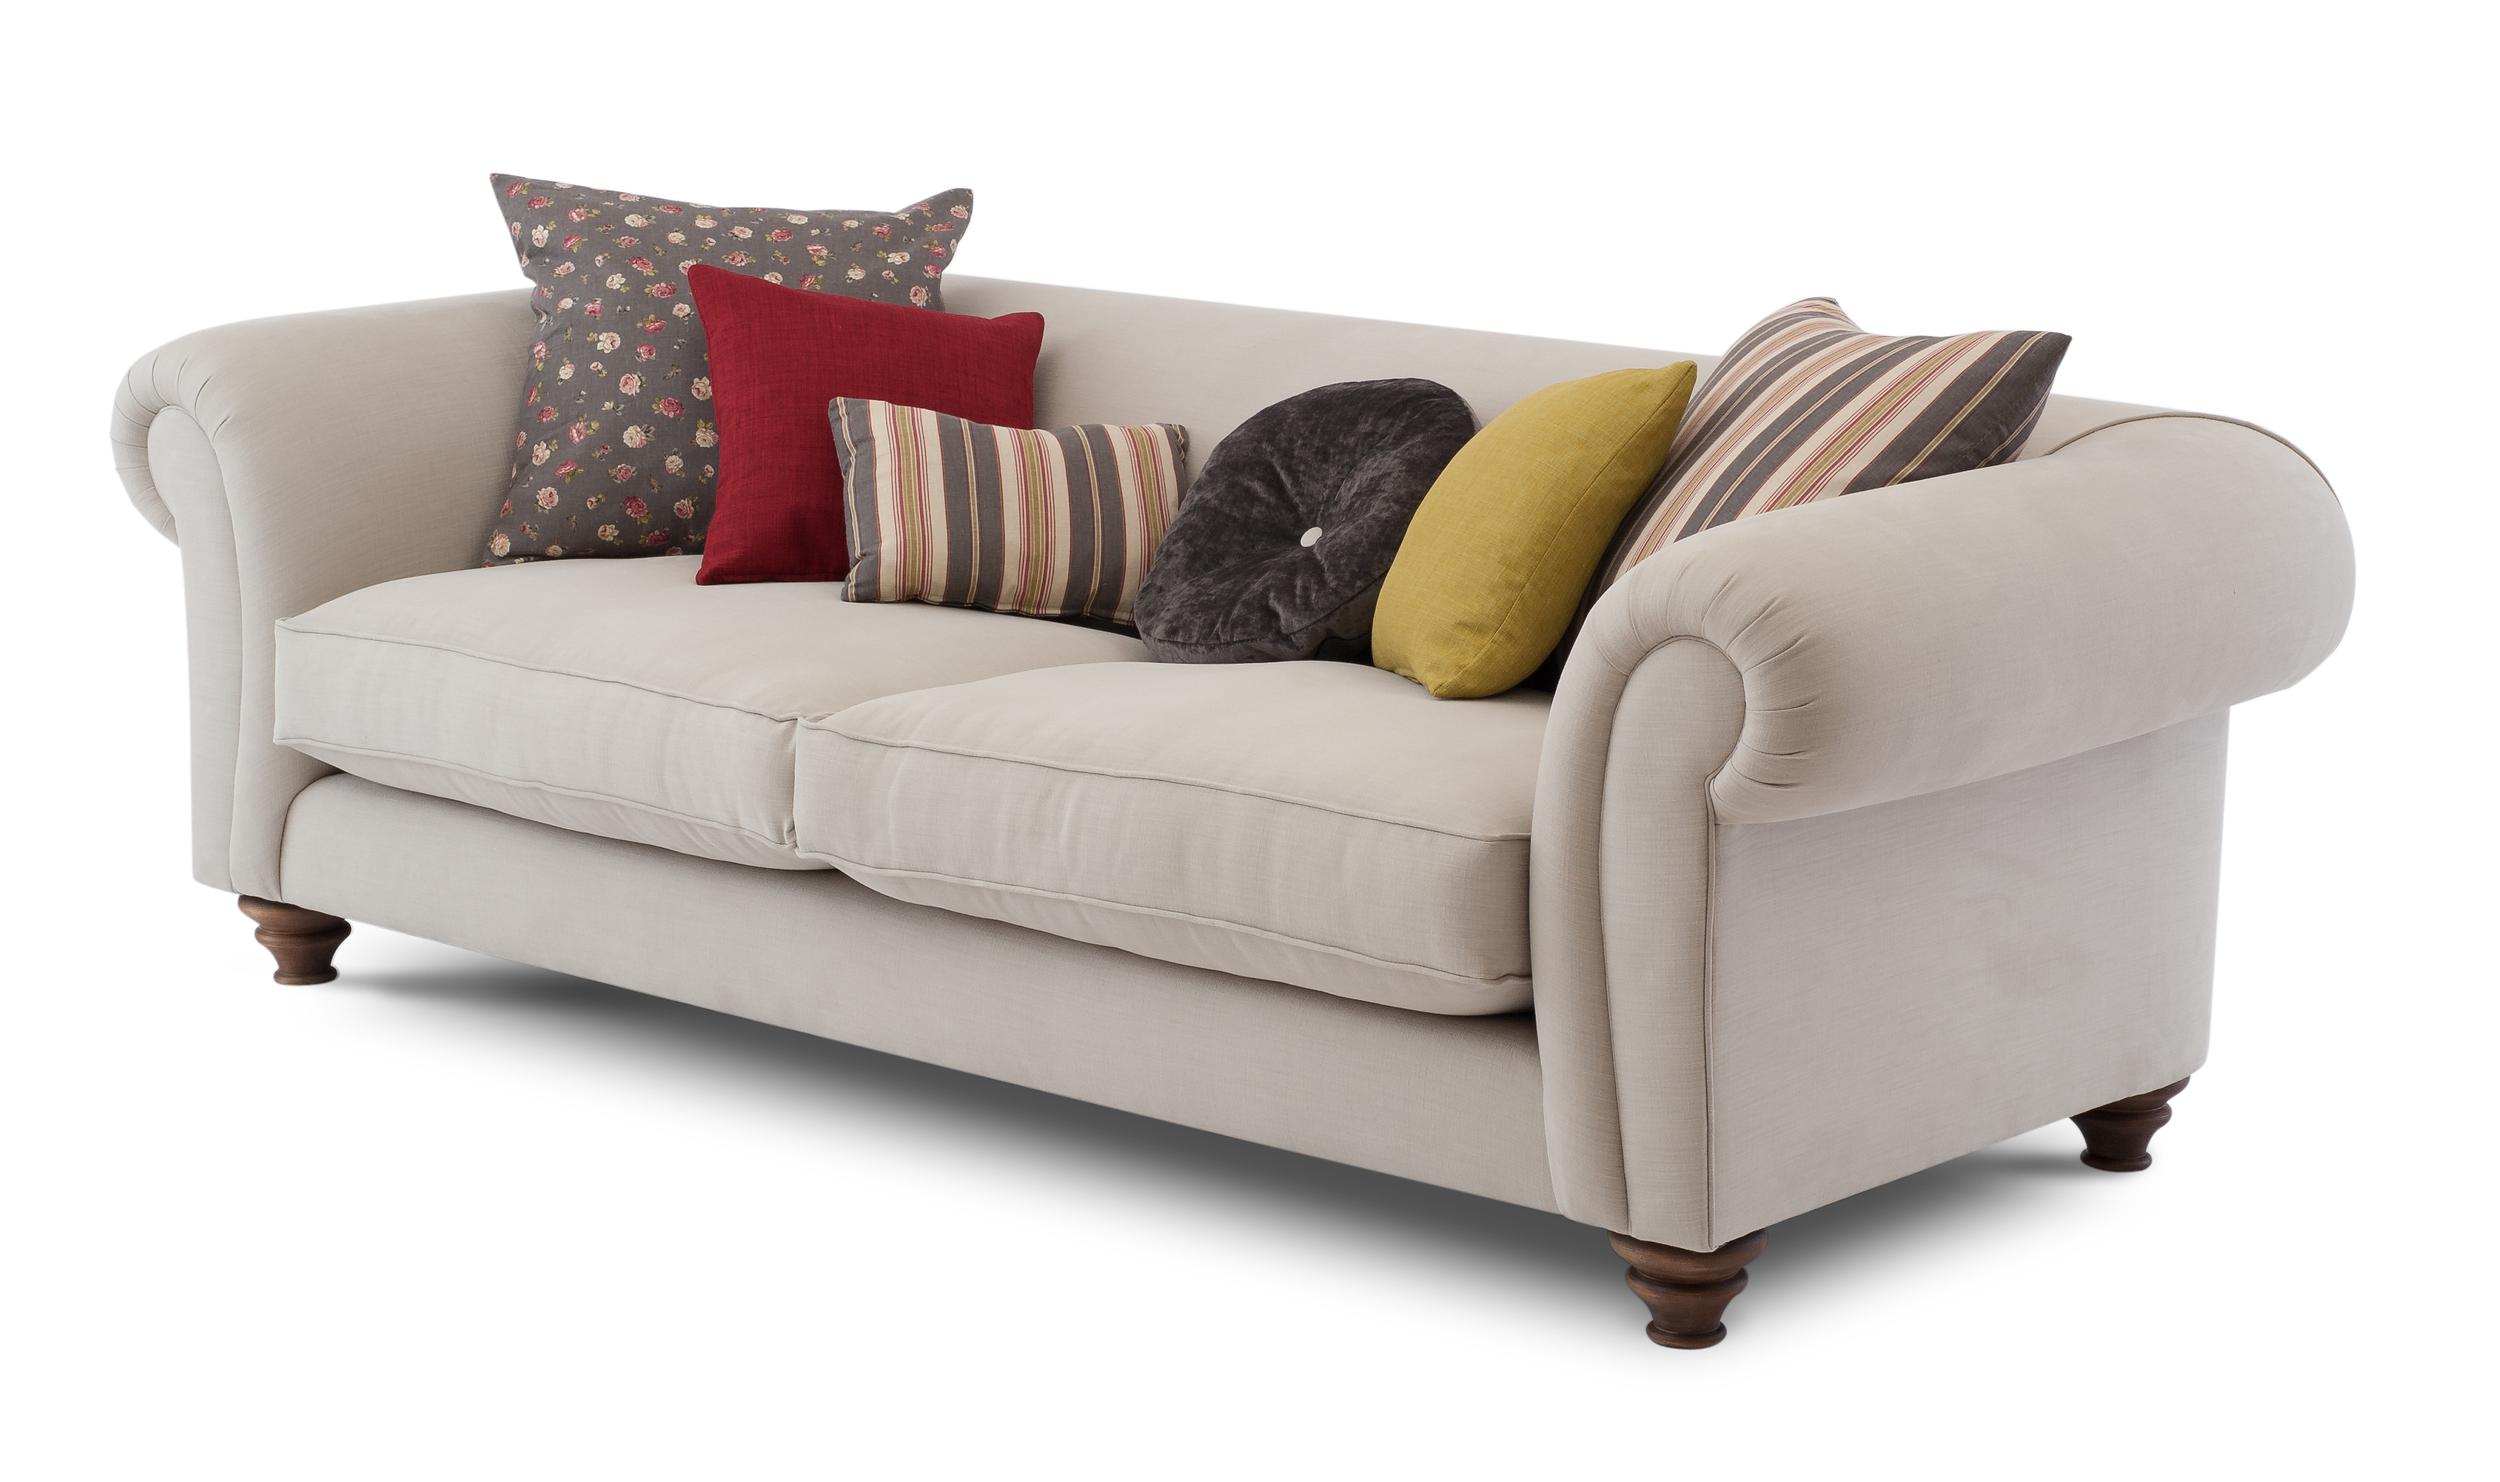 Carlin 4st Sofa-129.jpg